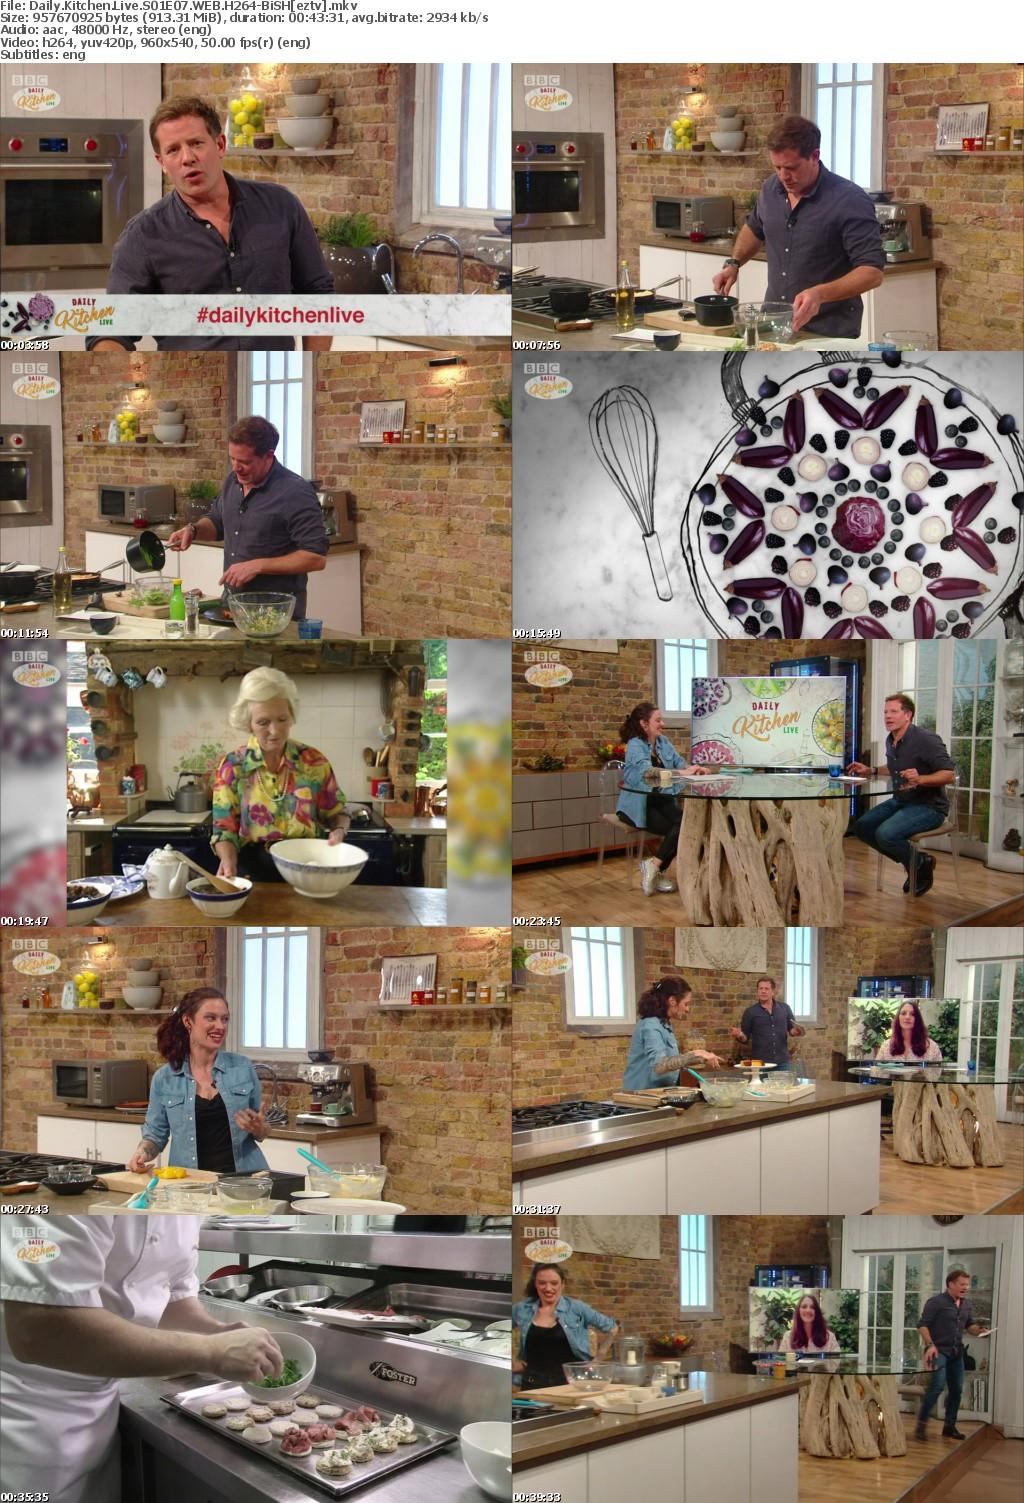 Daily Kitchen Live S01E07 WEB H264-BiSH